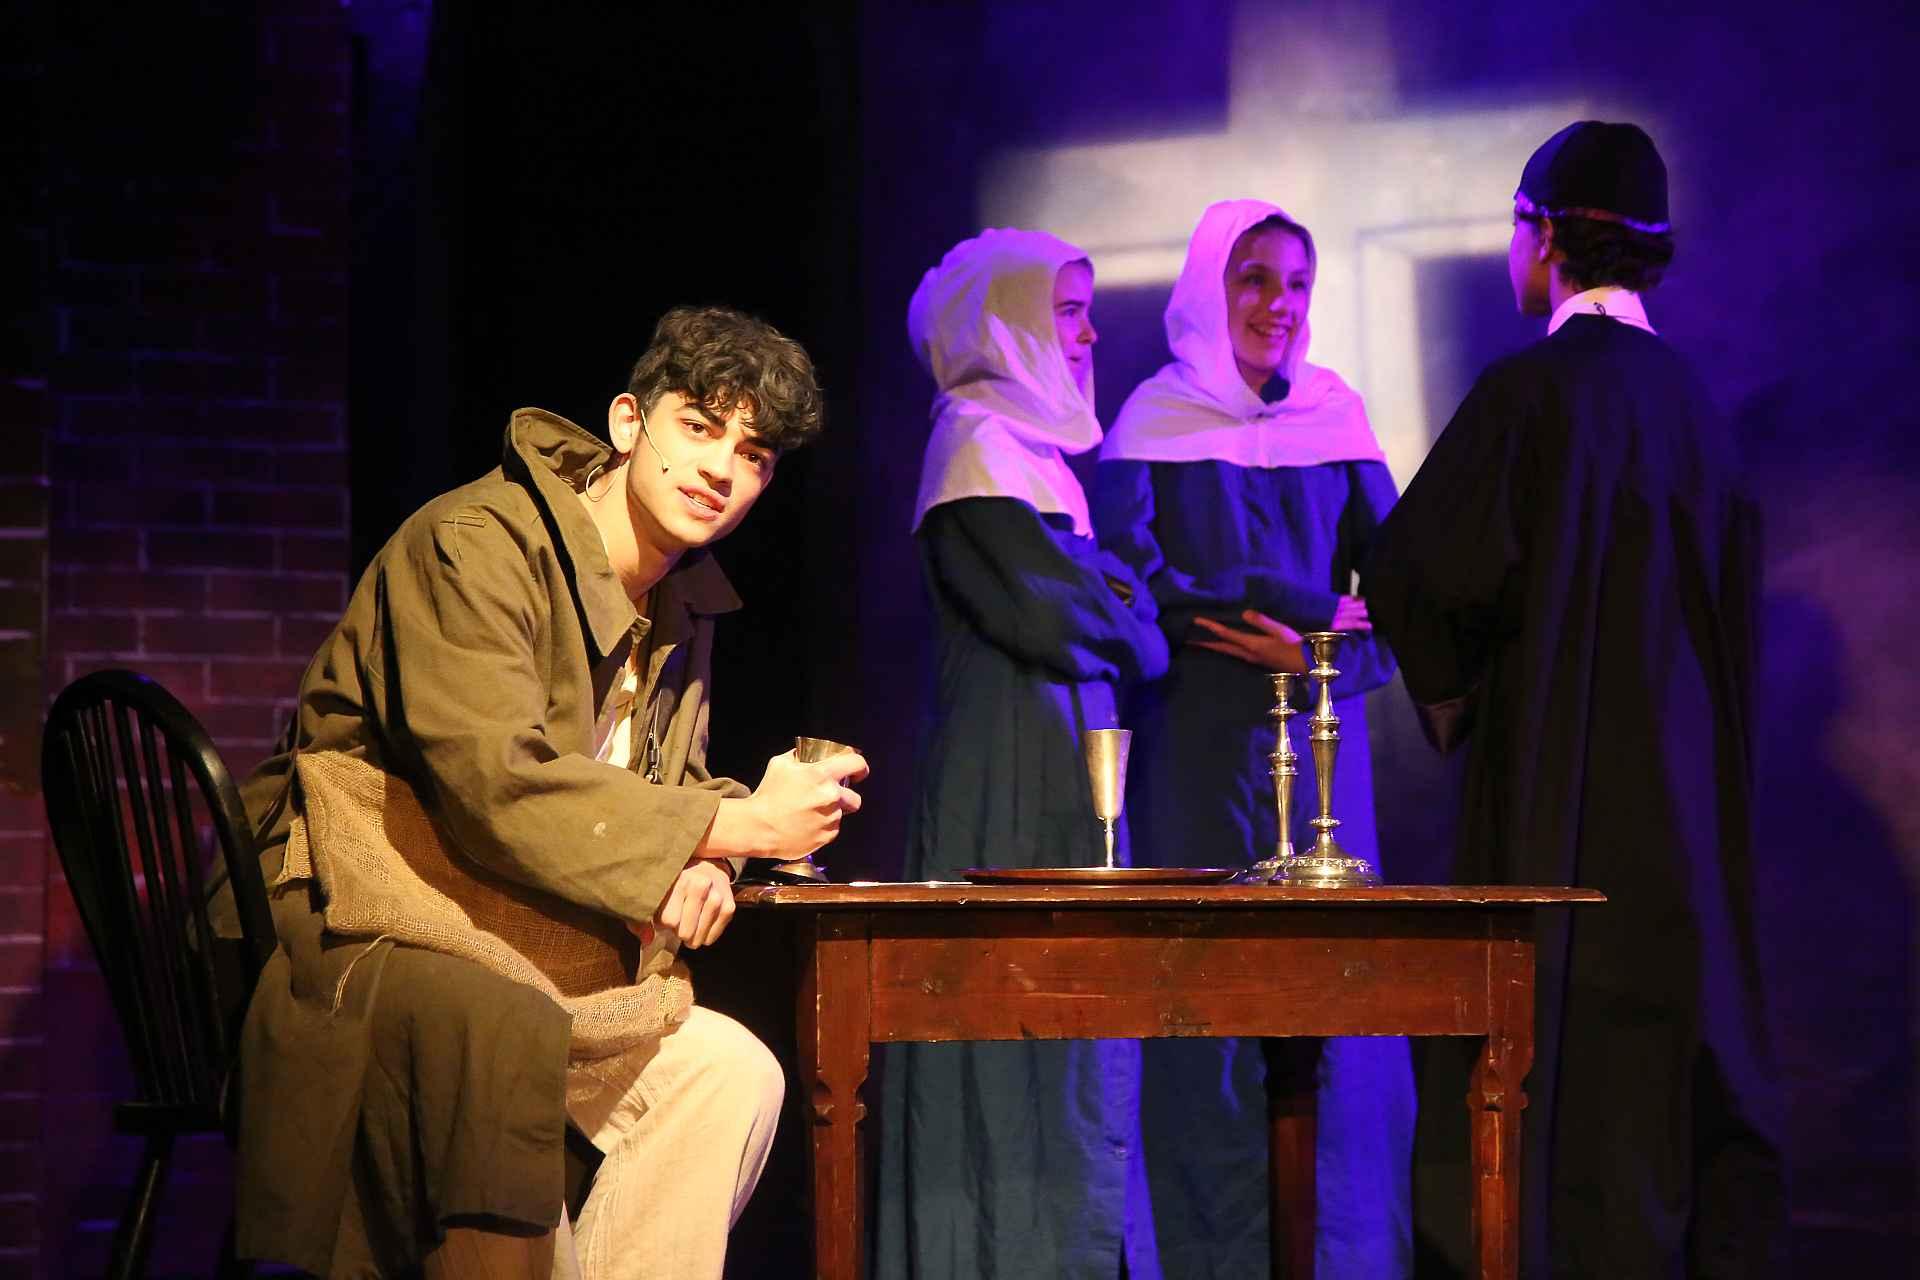 Image Jean Valjean and the Bishop